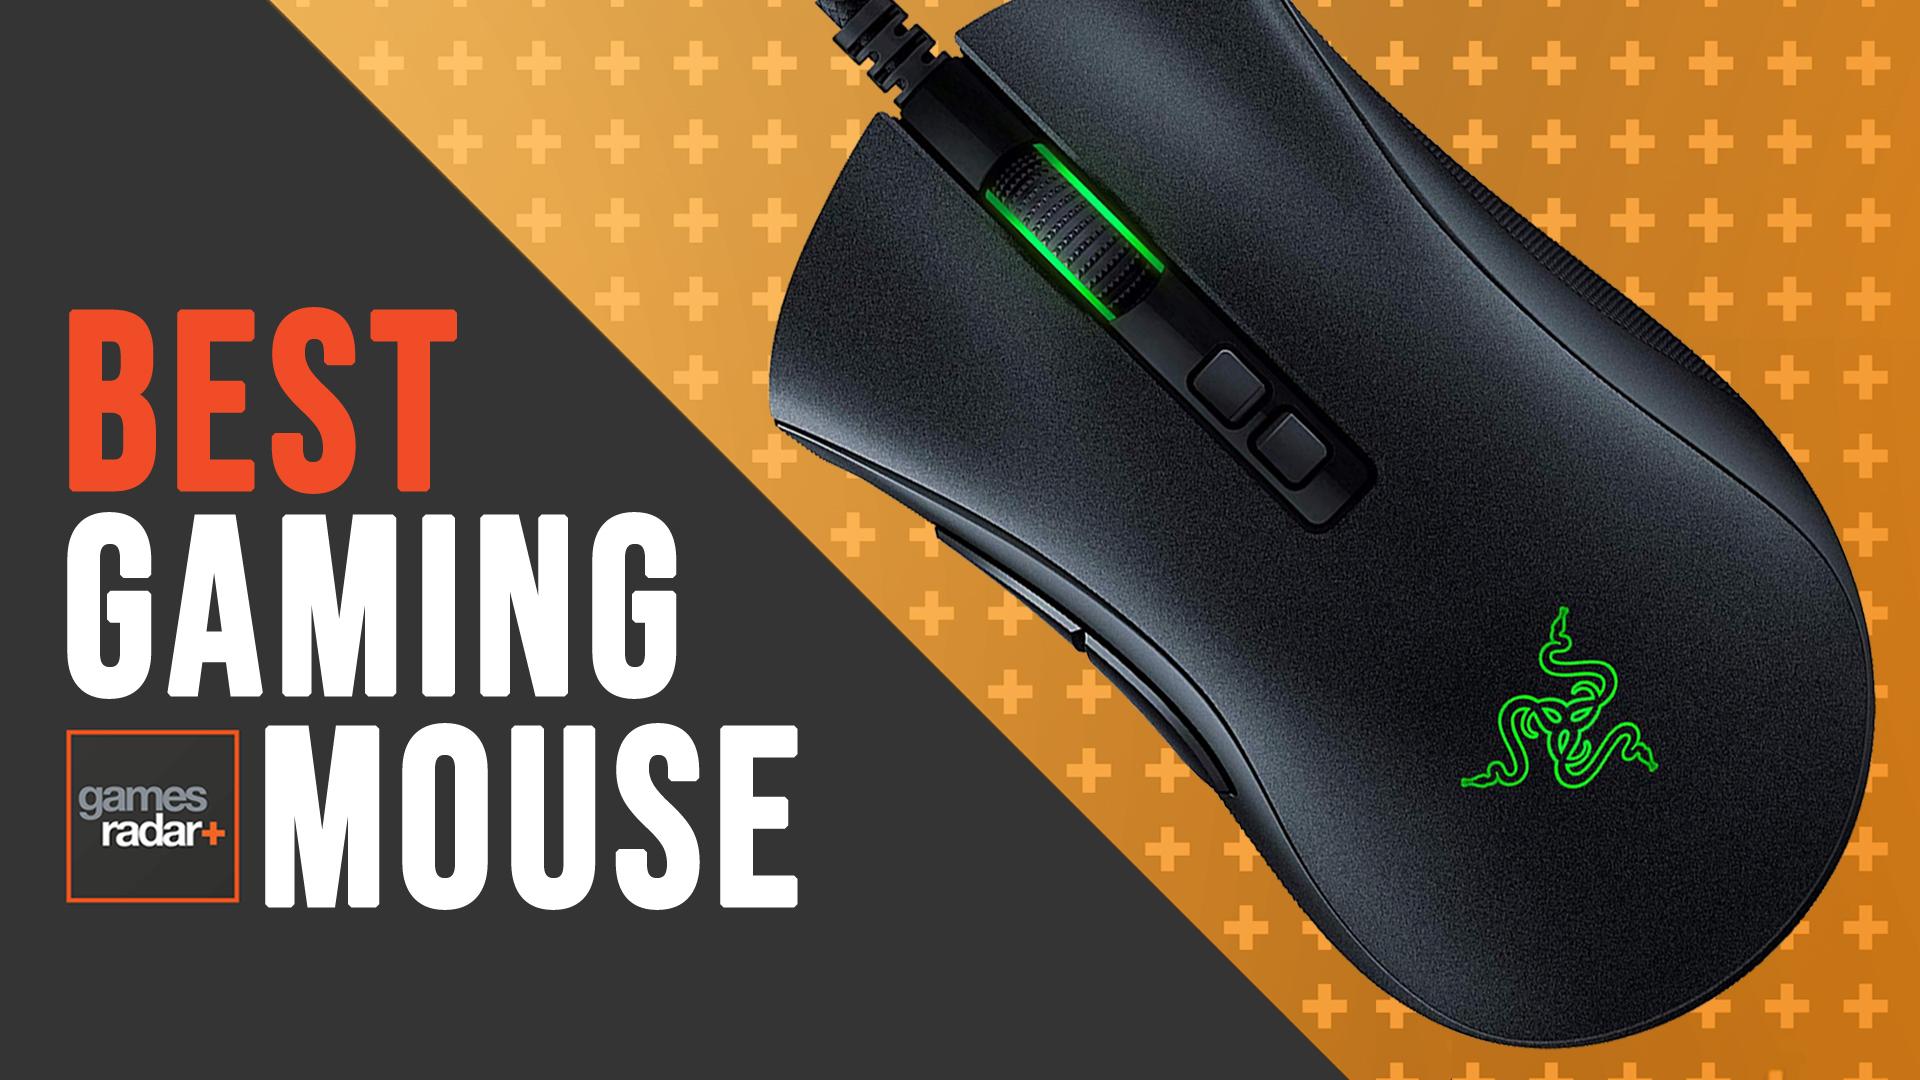 Best Gaming Mouse 2020 Gamesradar